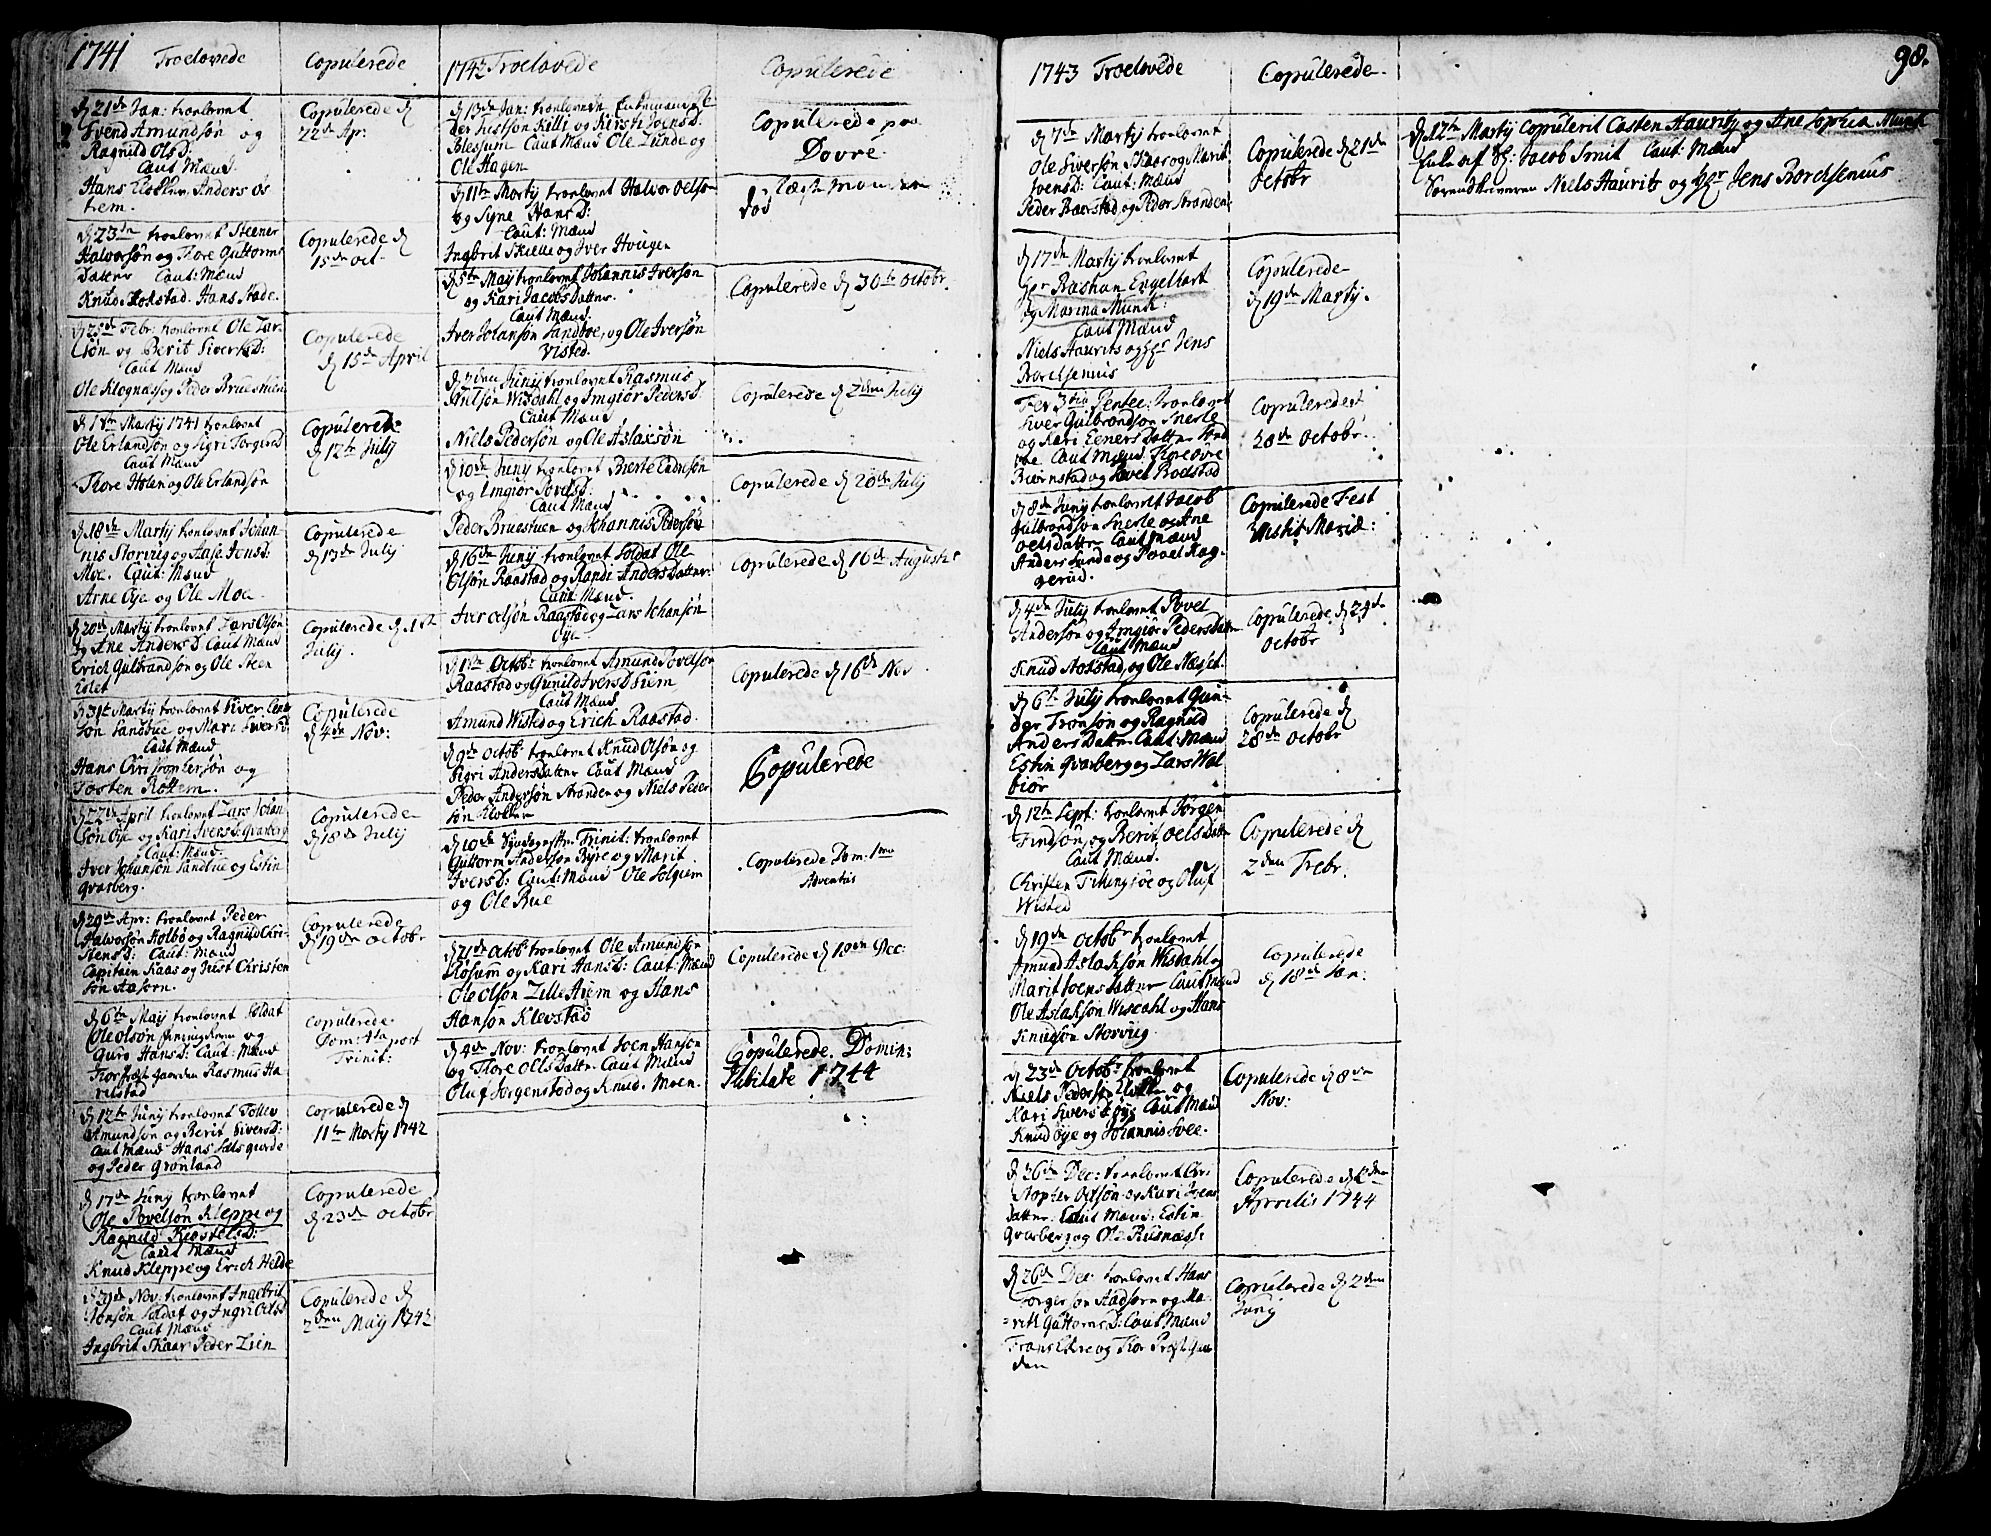 SAH, Vågå prestekontor, Ministerialbok nr. 1, 1739-1810, s. 98